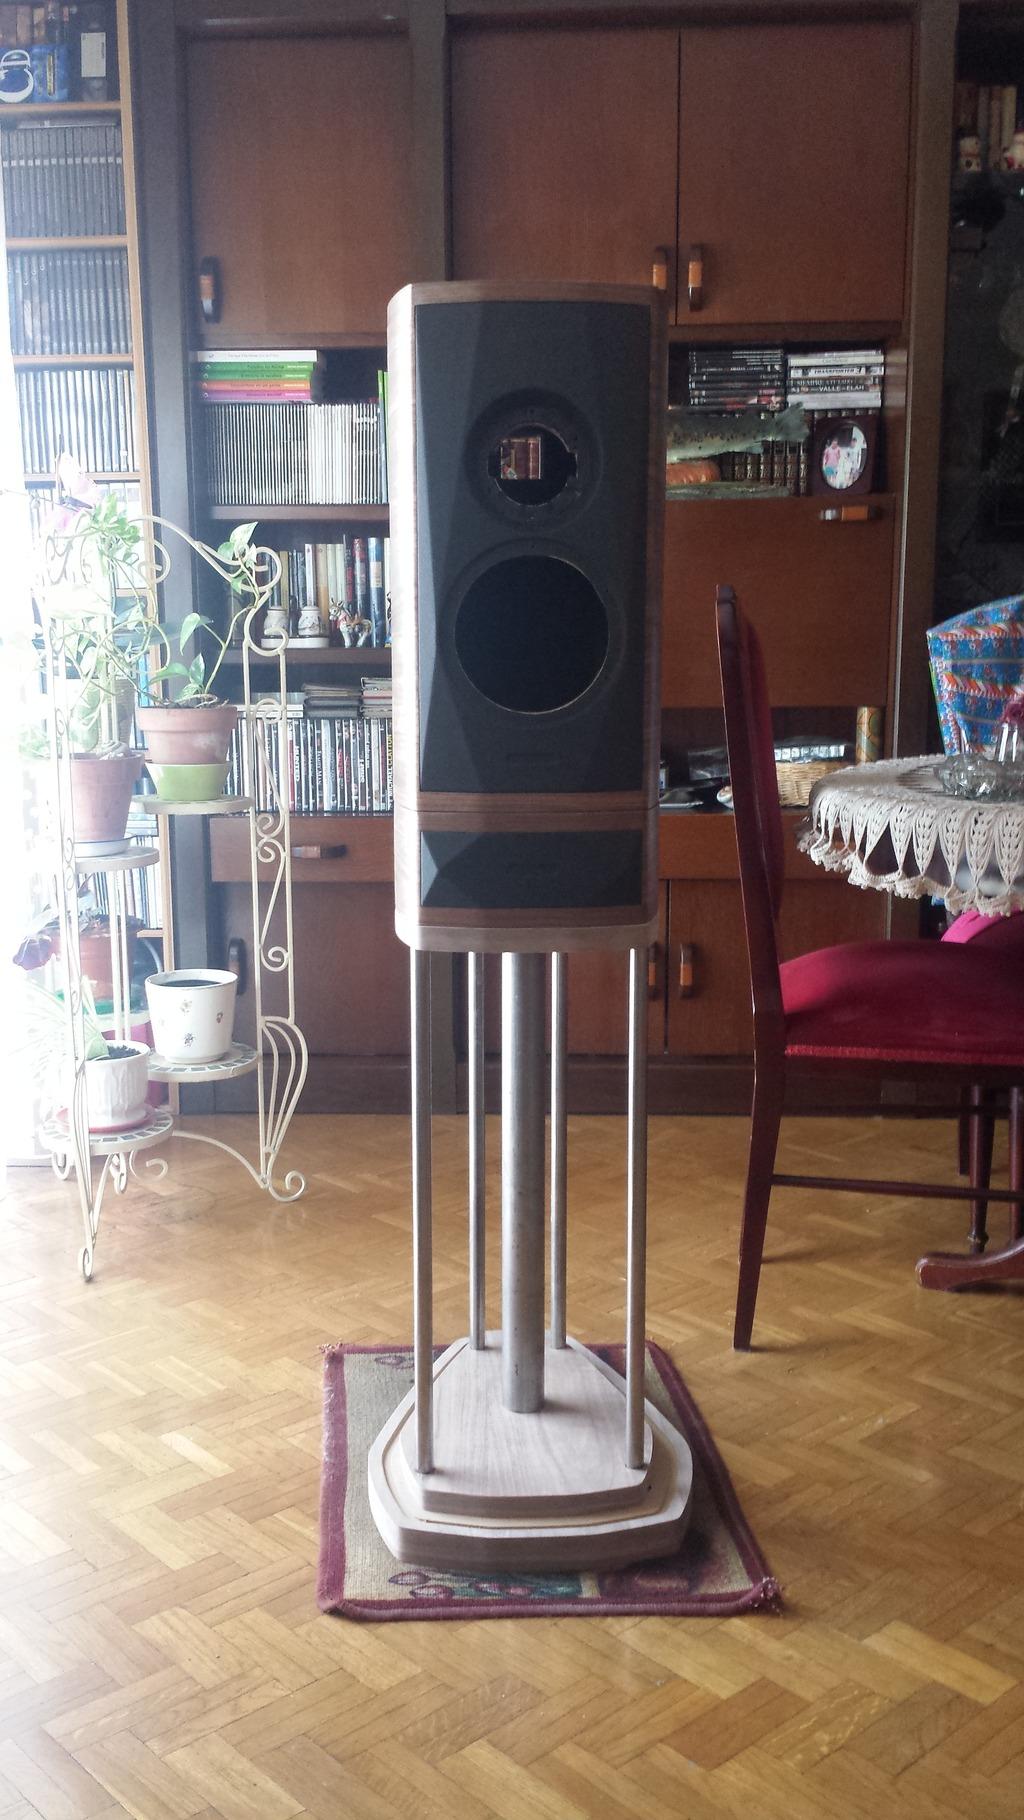 Monitores Audiotechnology C-Quenze 18H521706SD + Seas Excel T29MF001 - Página 6 2015-07-19%2013.25.29_zpsrwlfwsav